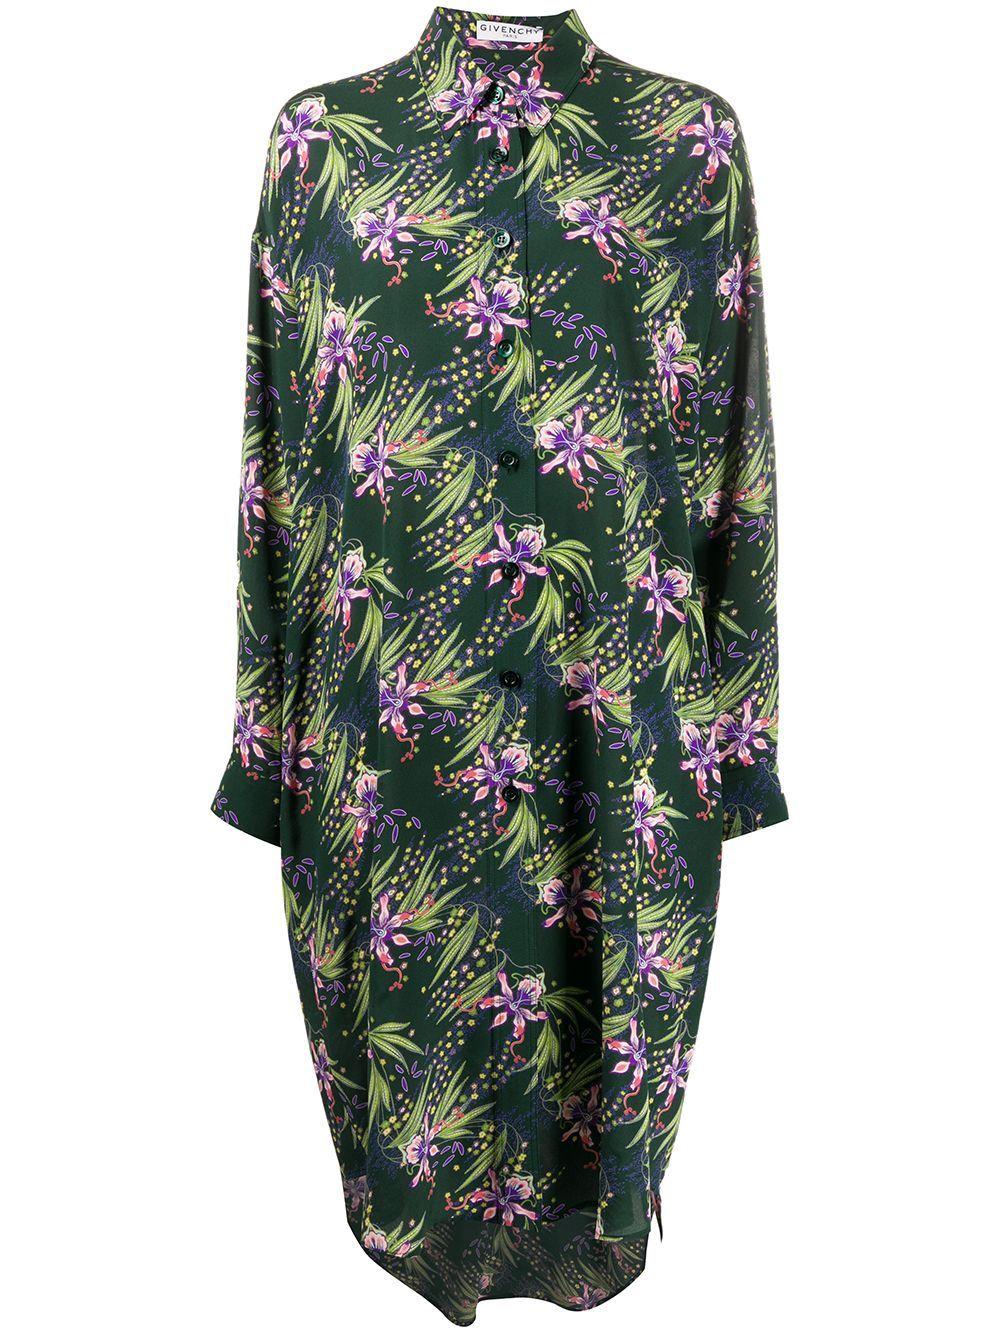 Givenchy floral print silk shirt dress - Green